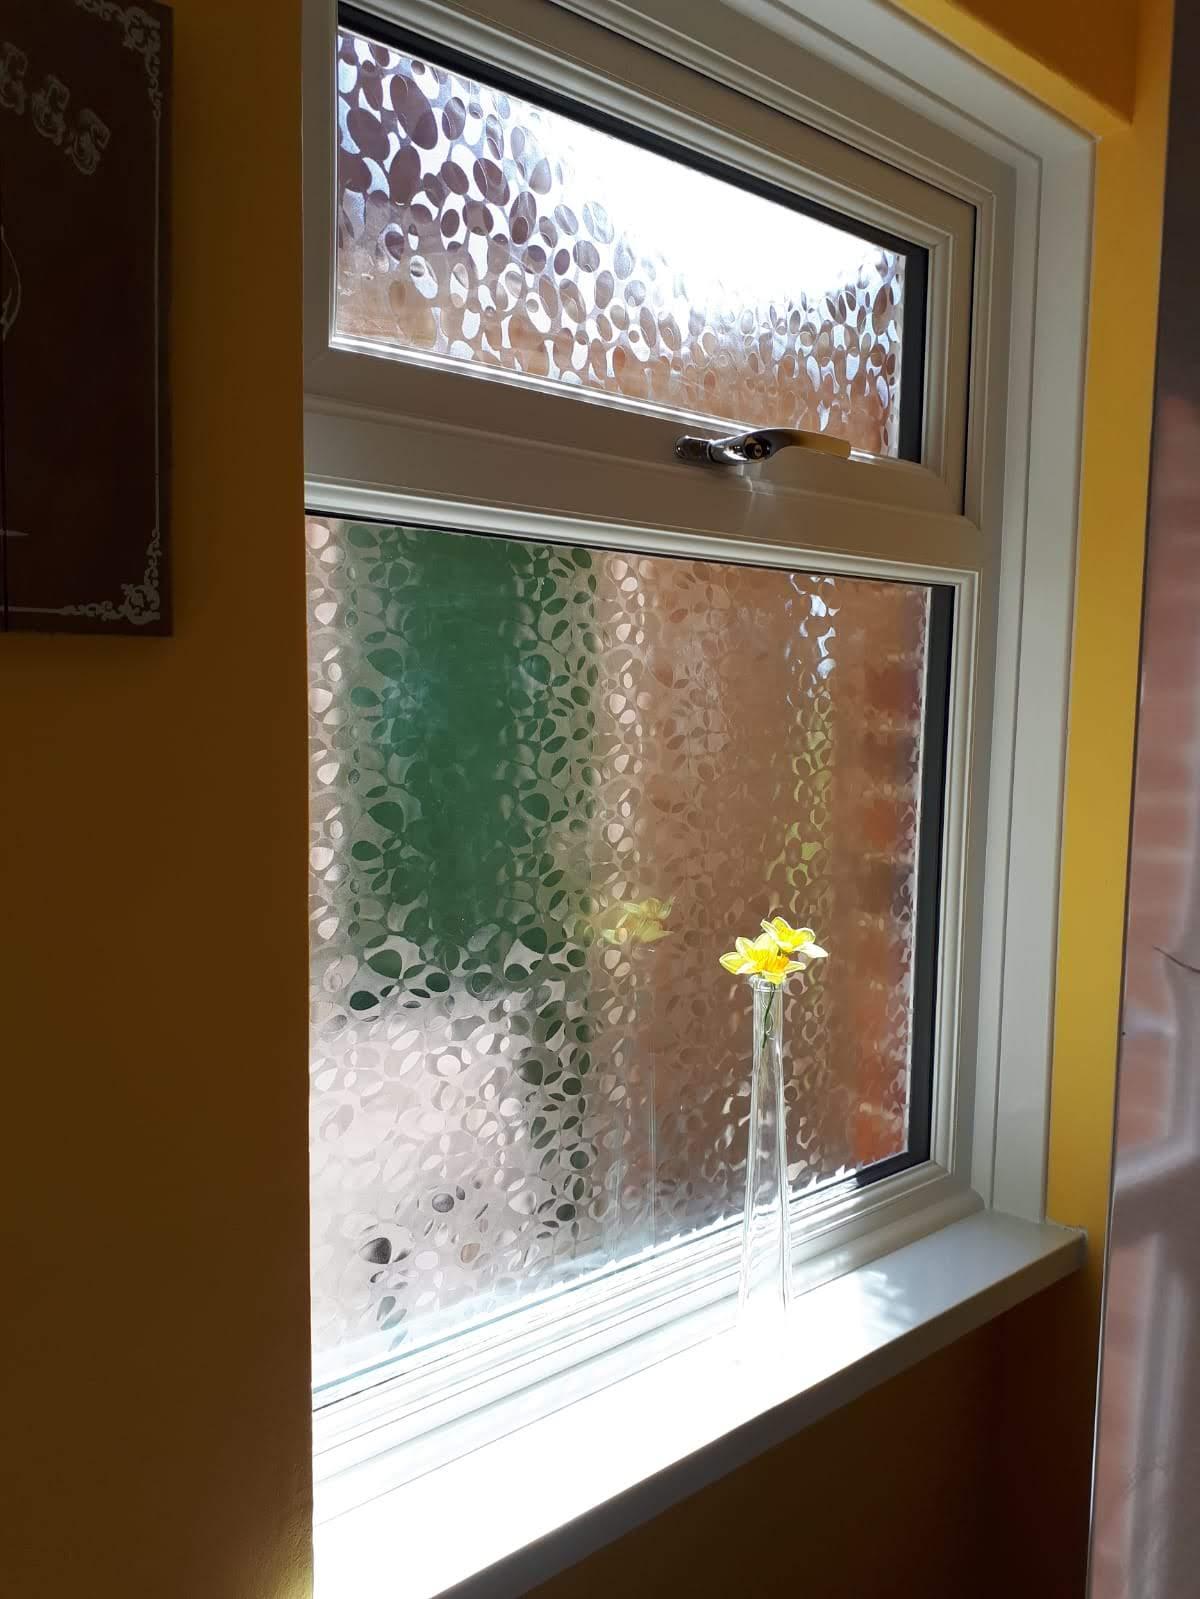 Image of new PVC window installation.